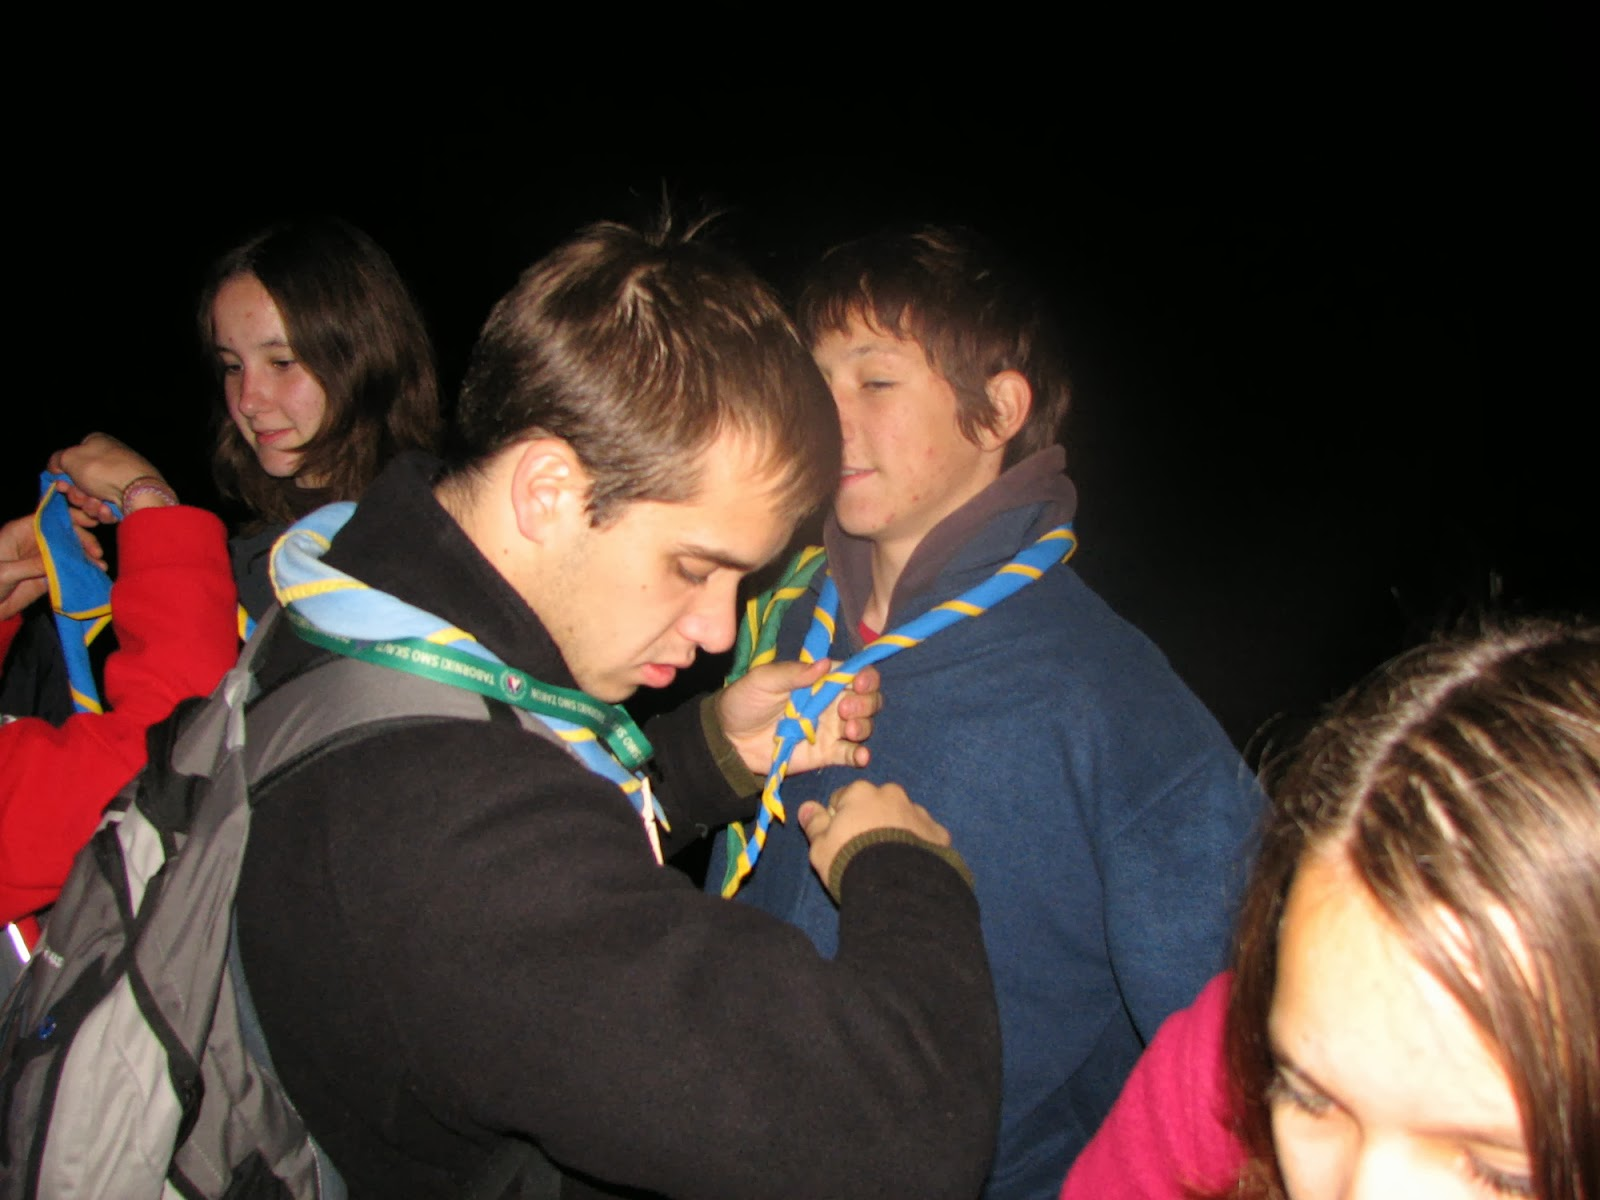 Prehod PP, Ilirska Bistrica 2005 - picture%2B086.jpg